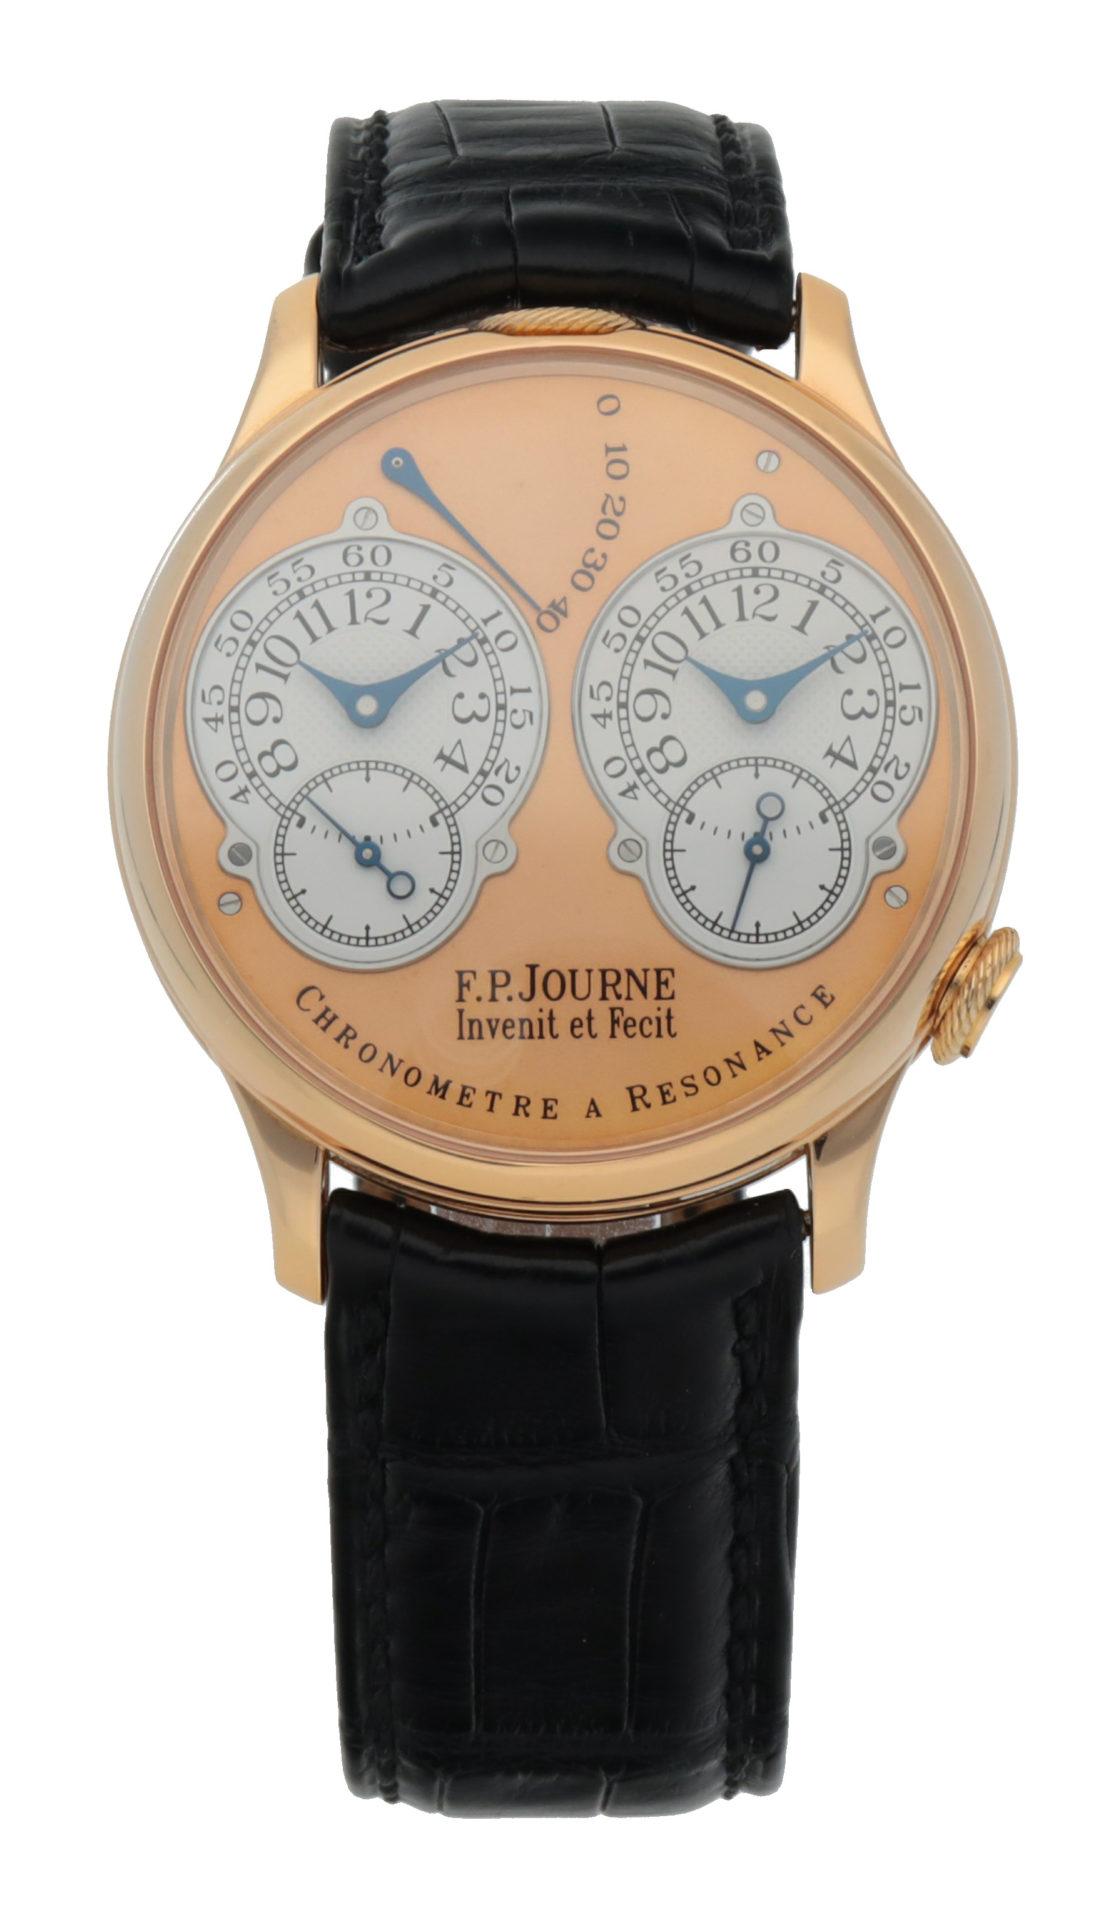 2002 F.P. Journe Chronomètre à Résonance achieved $261,386 in Geneva in November.